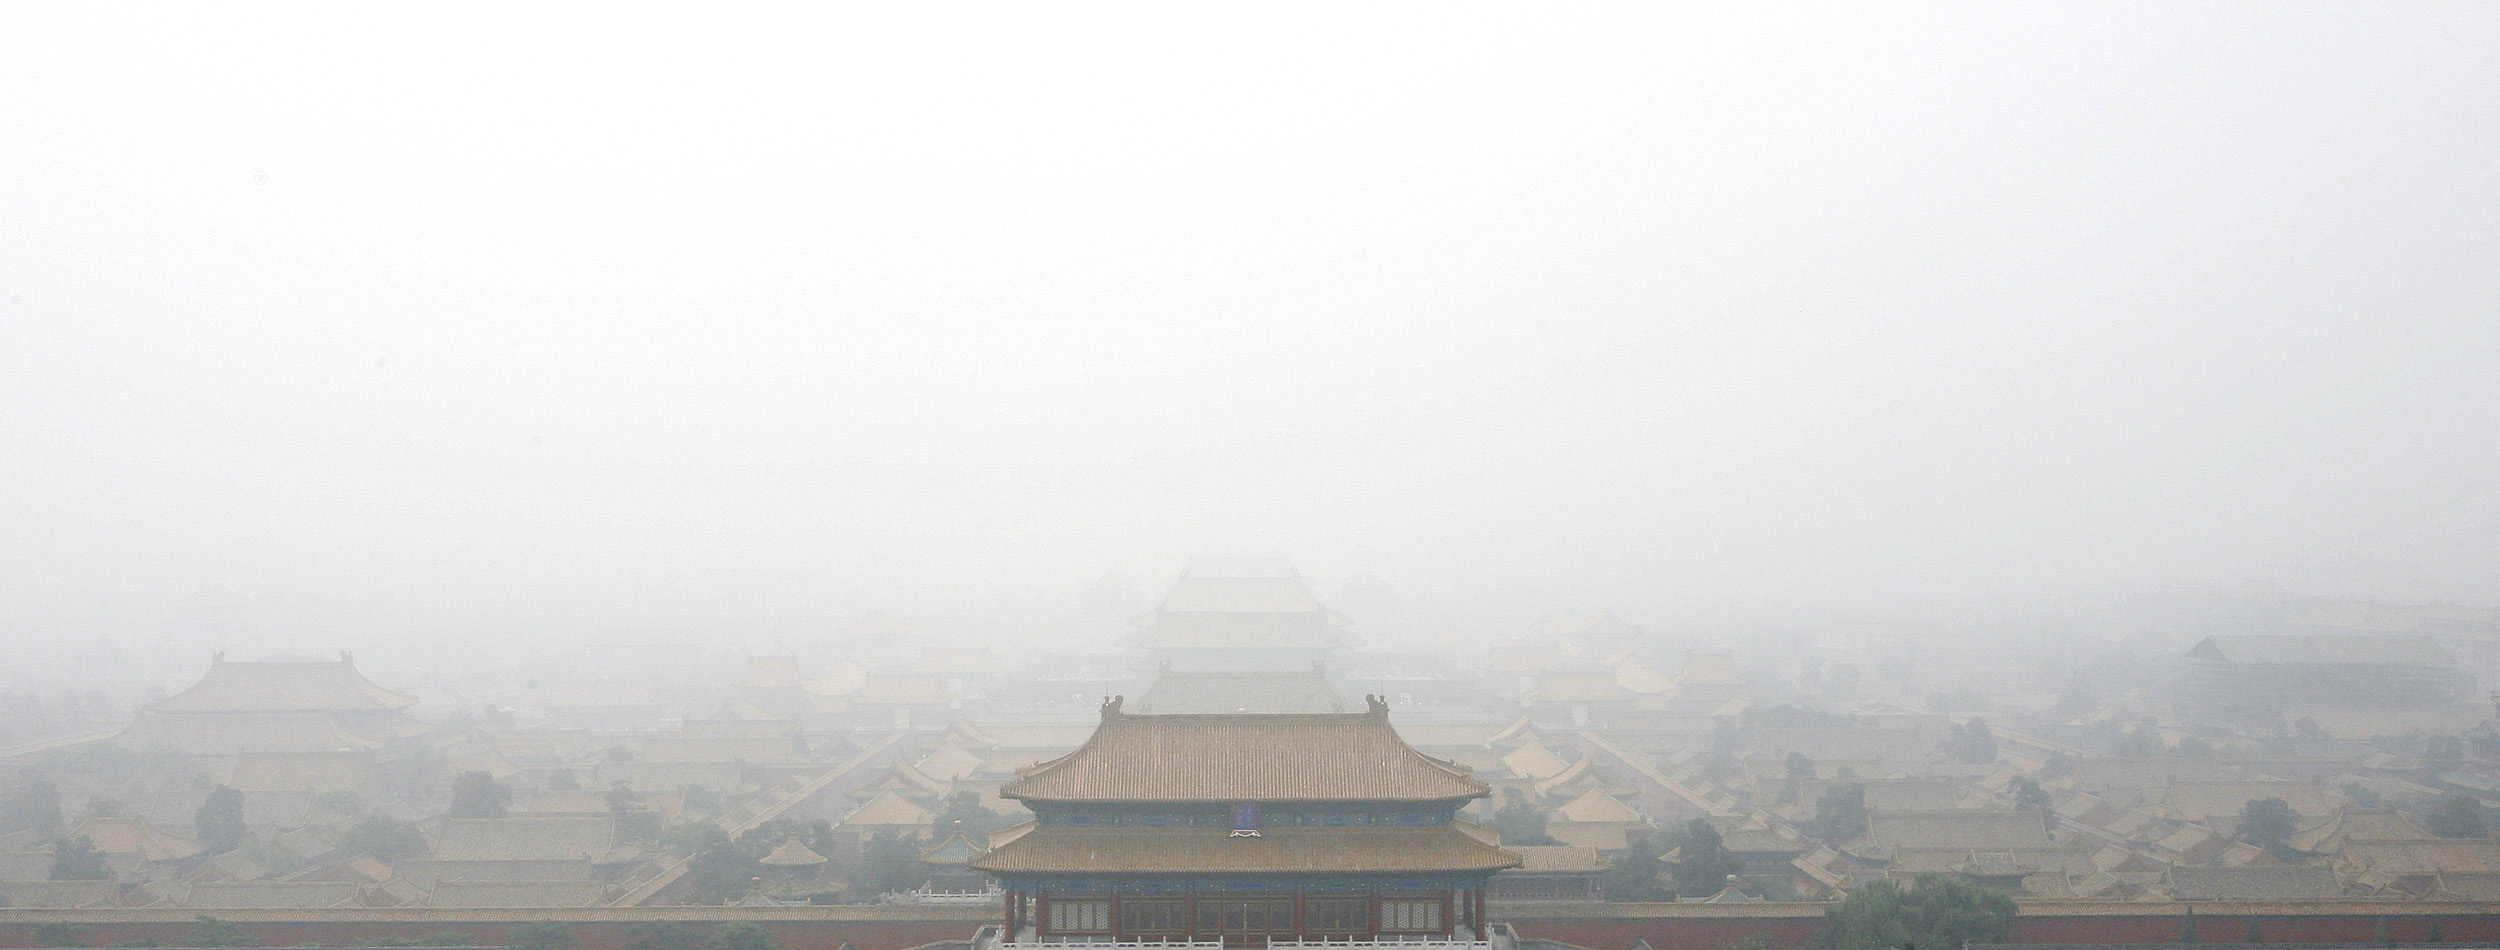 Beijing (Getty)